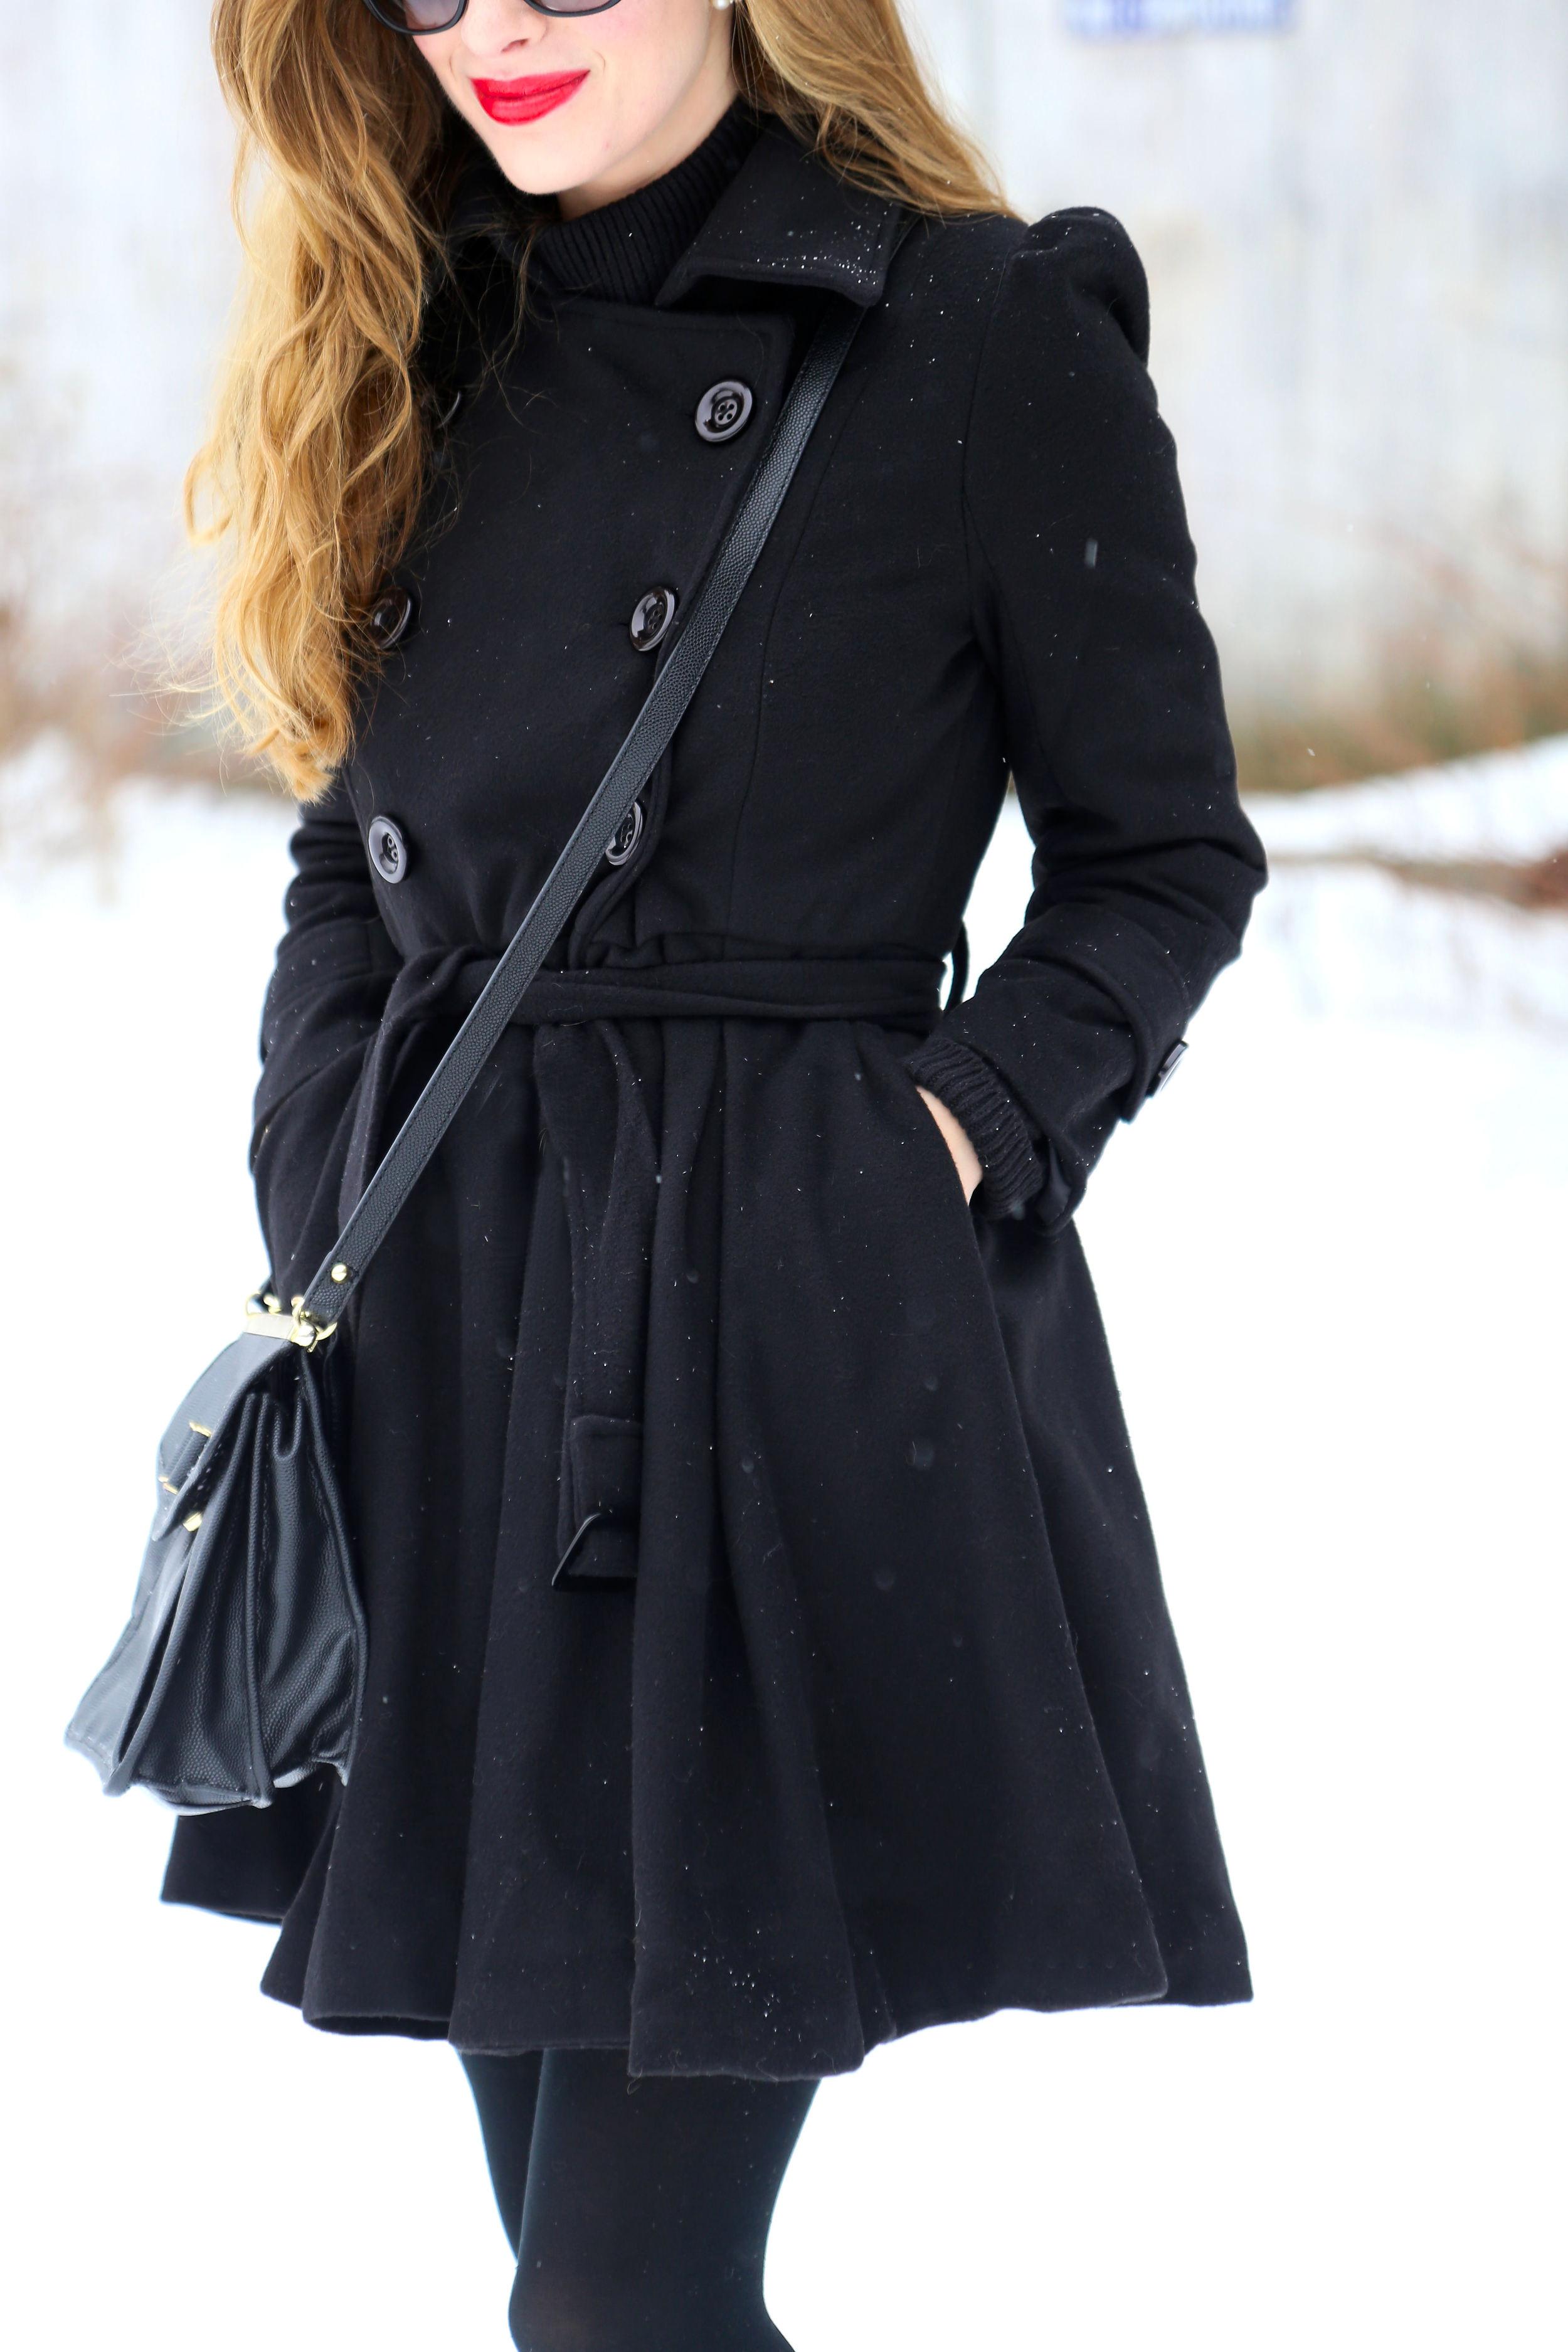 Black On Black- Enchanting Elegance